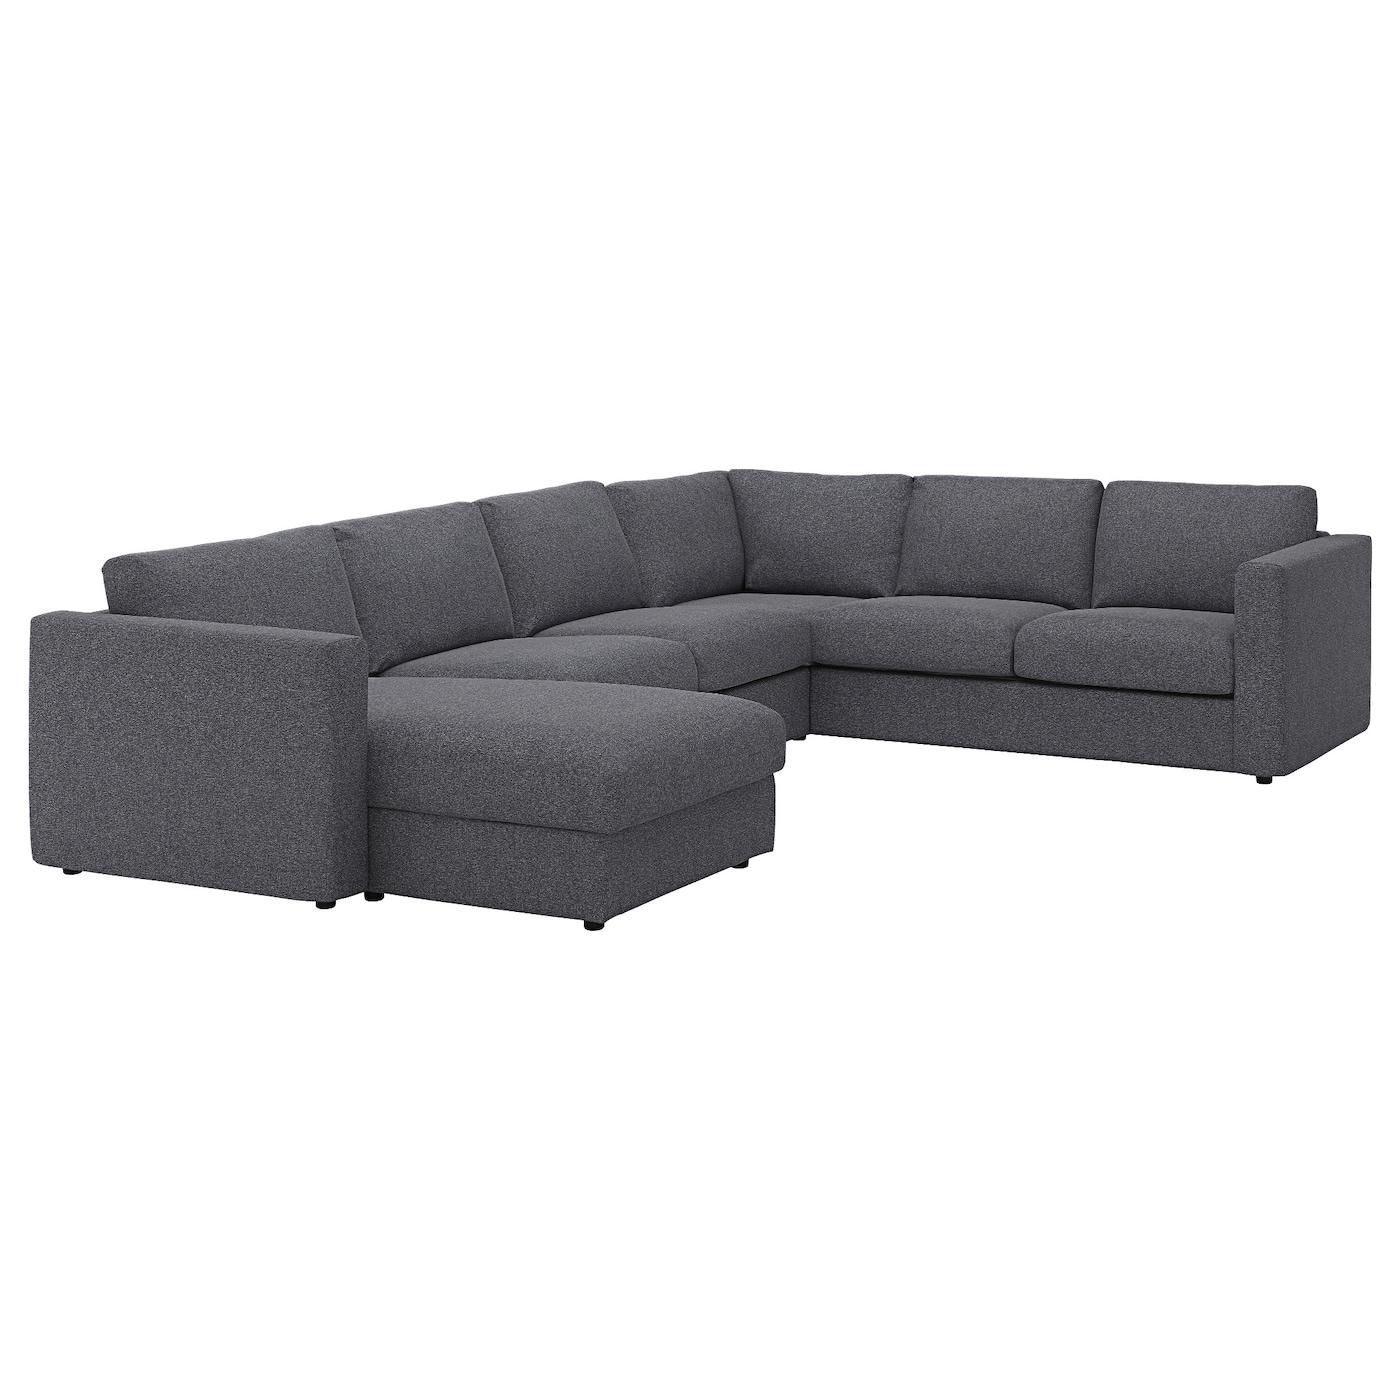 leather corner sofa – it-is-my.website